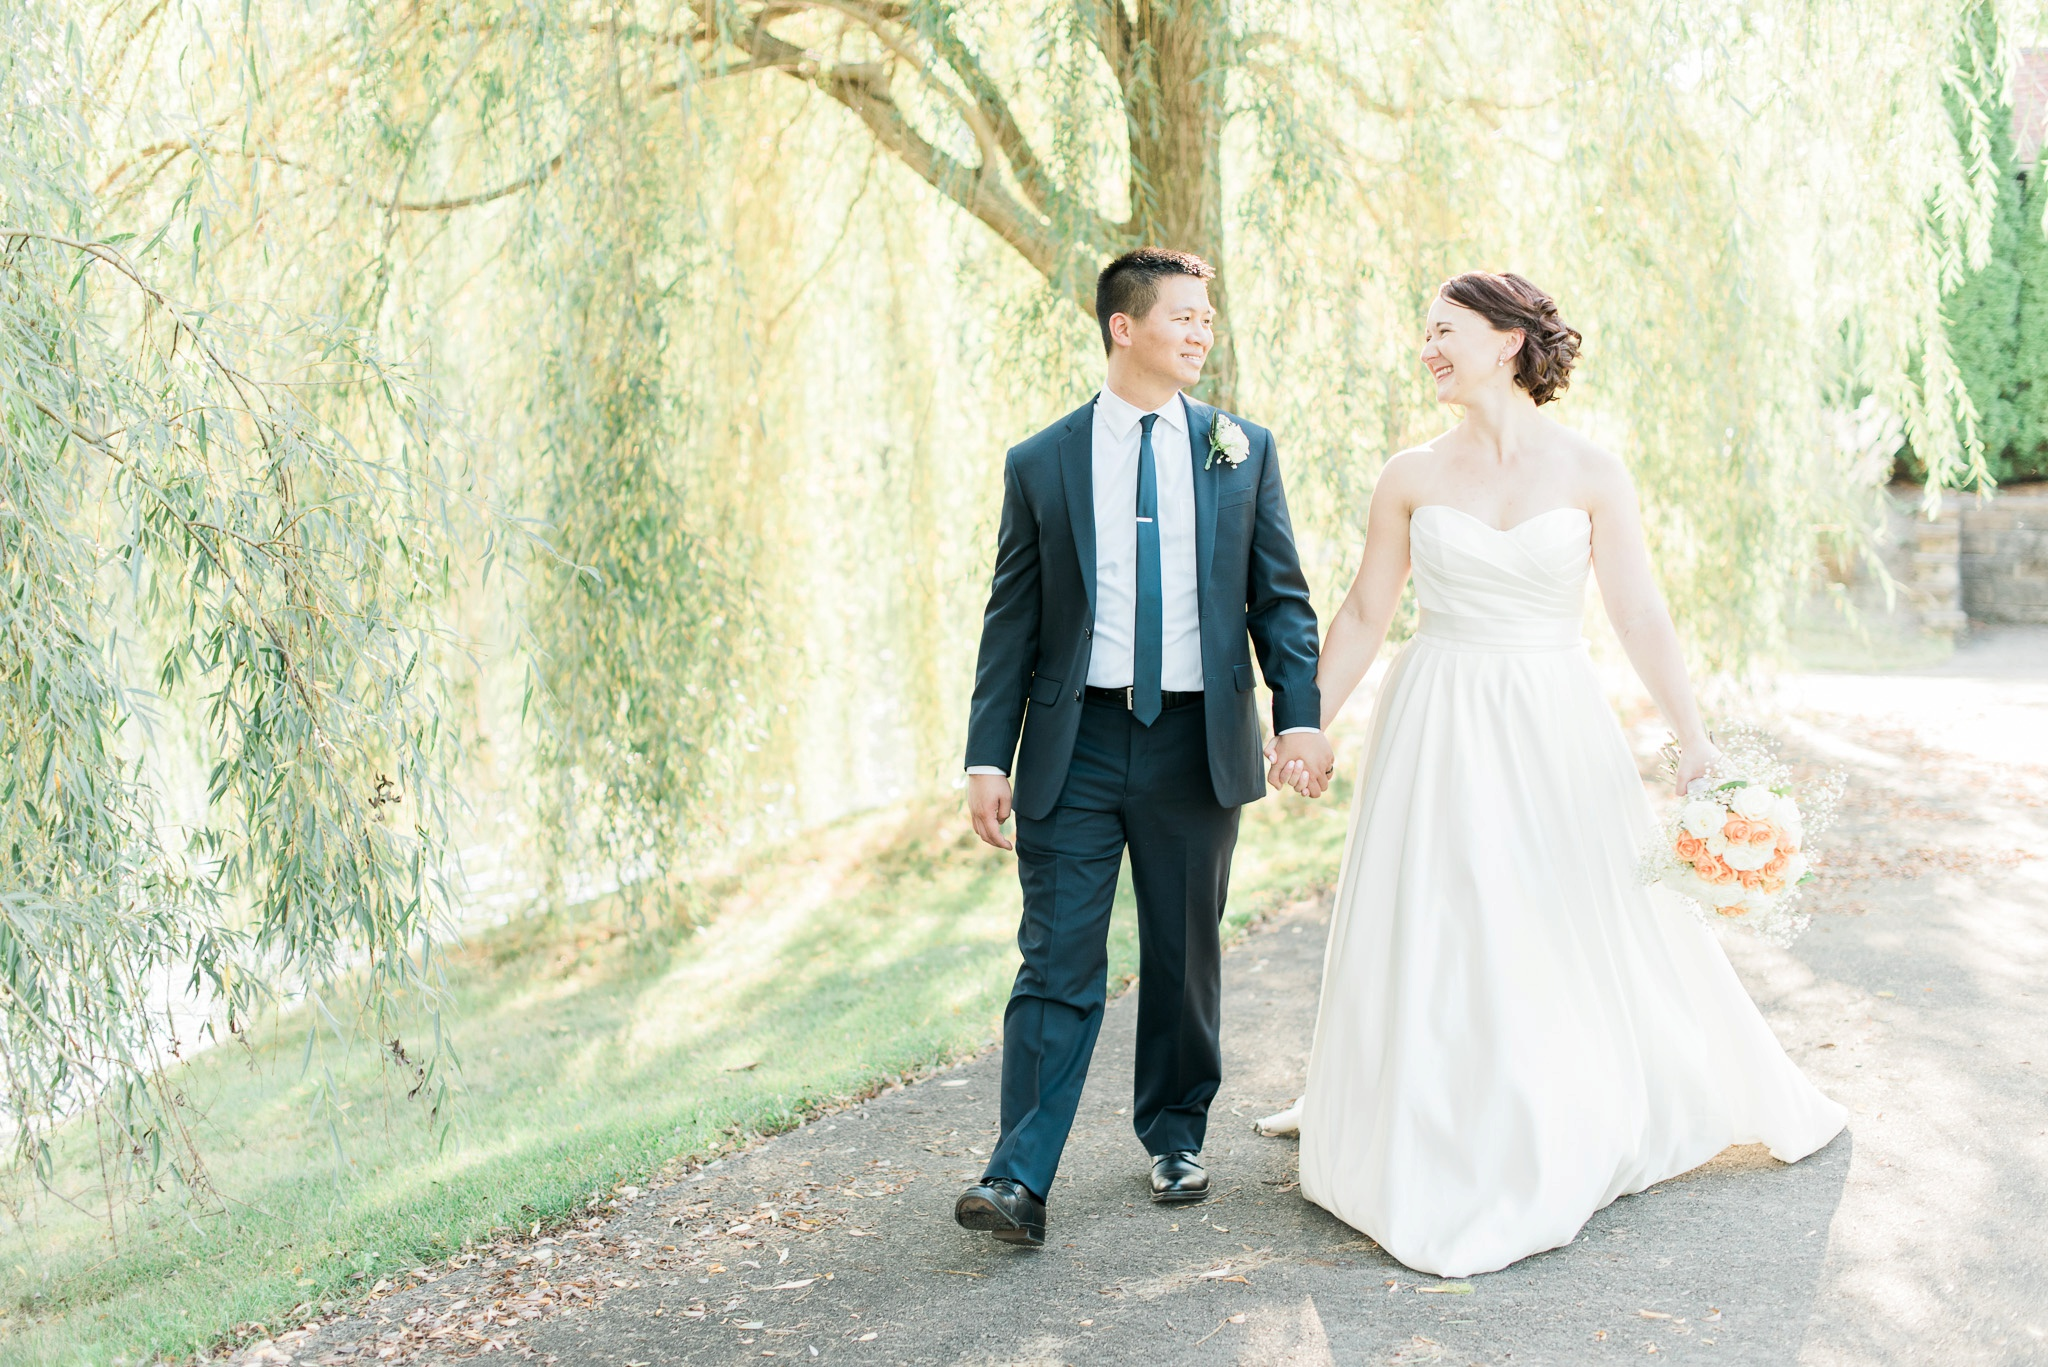 brookside-golf-country-club-wedding-columbus-ohio-100.jpg